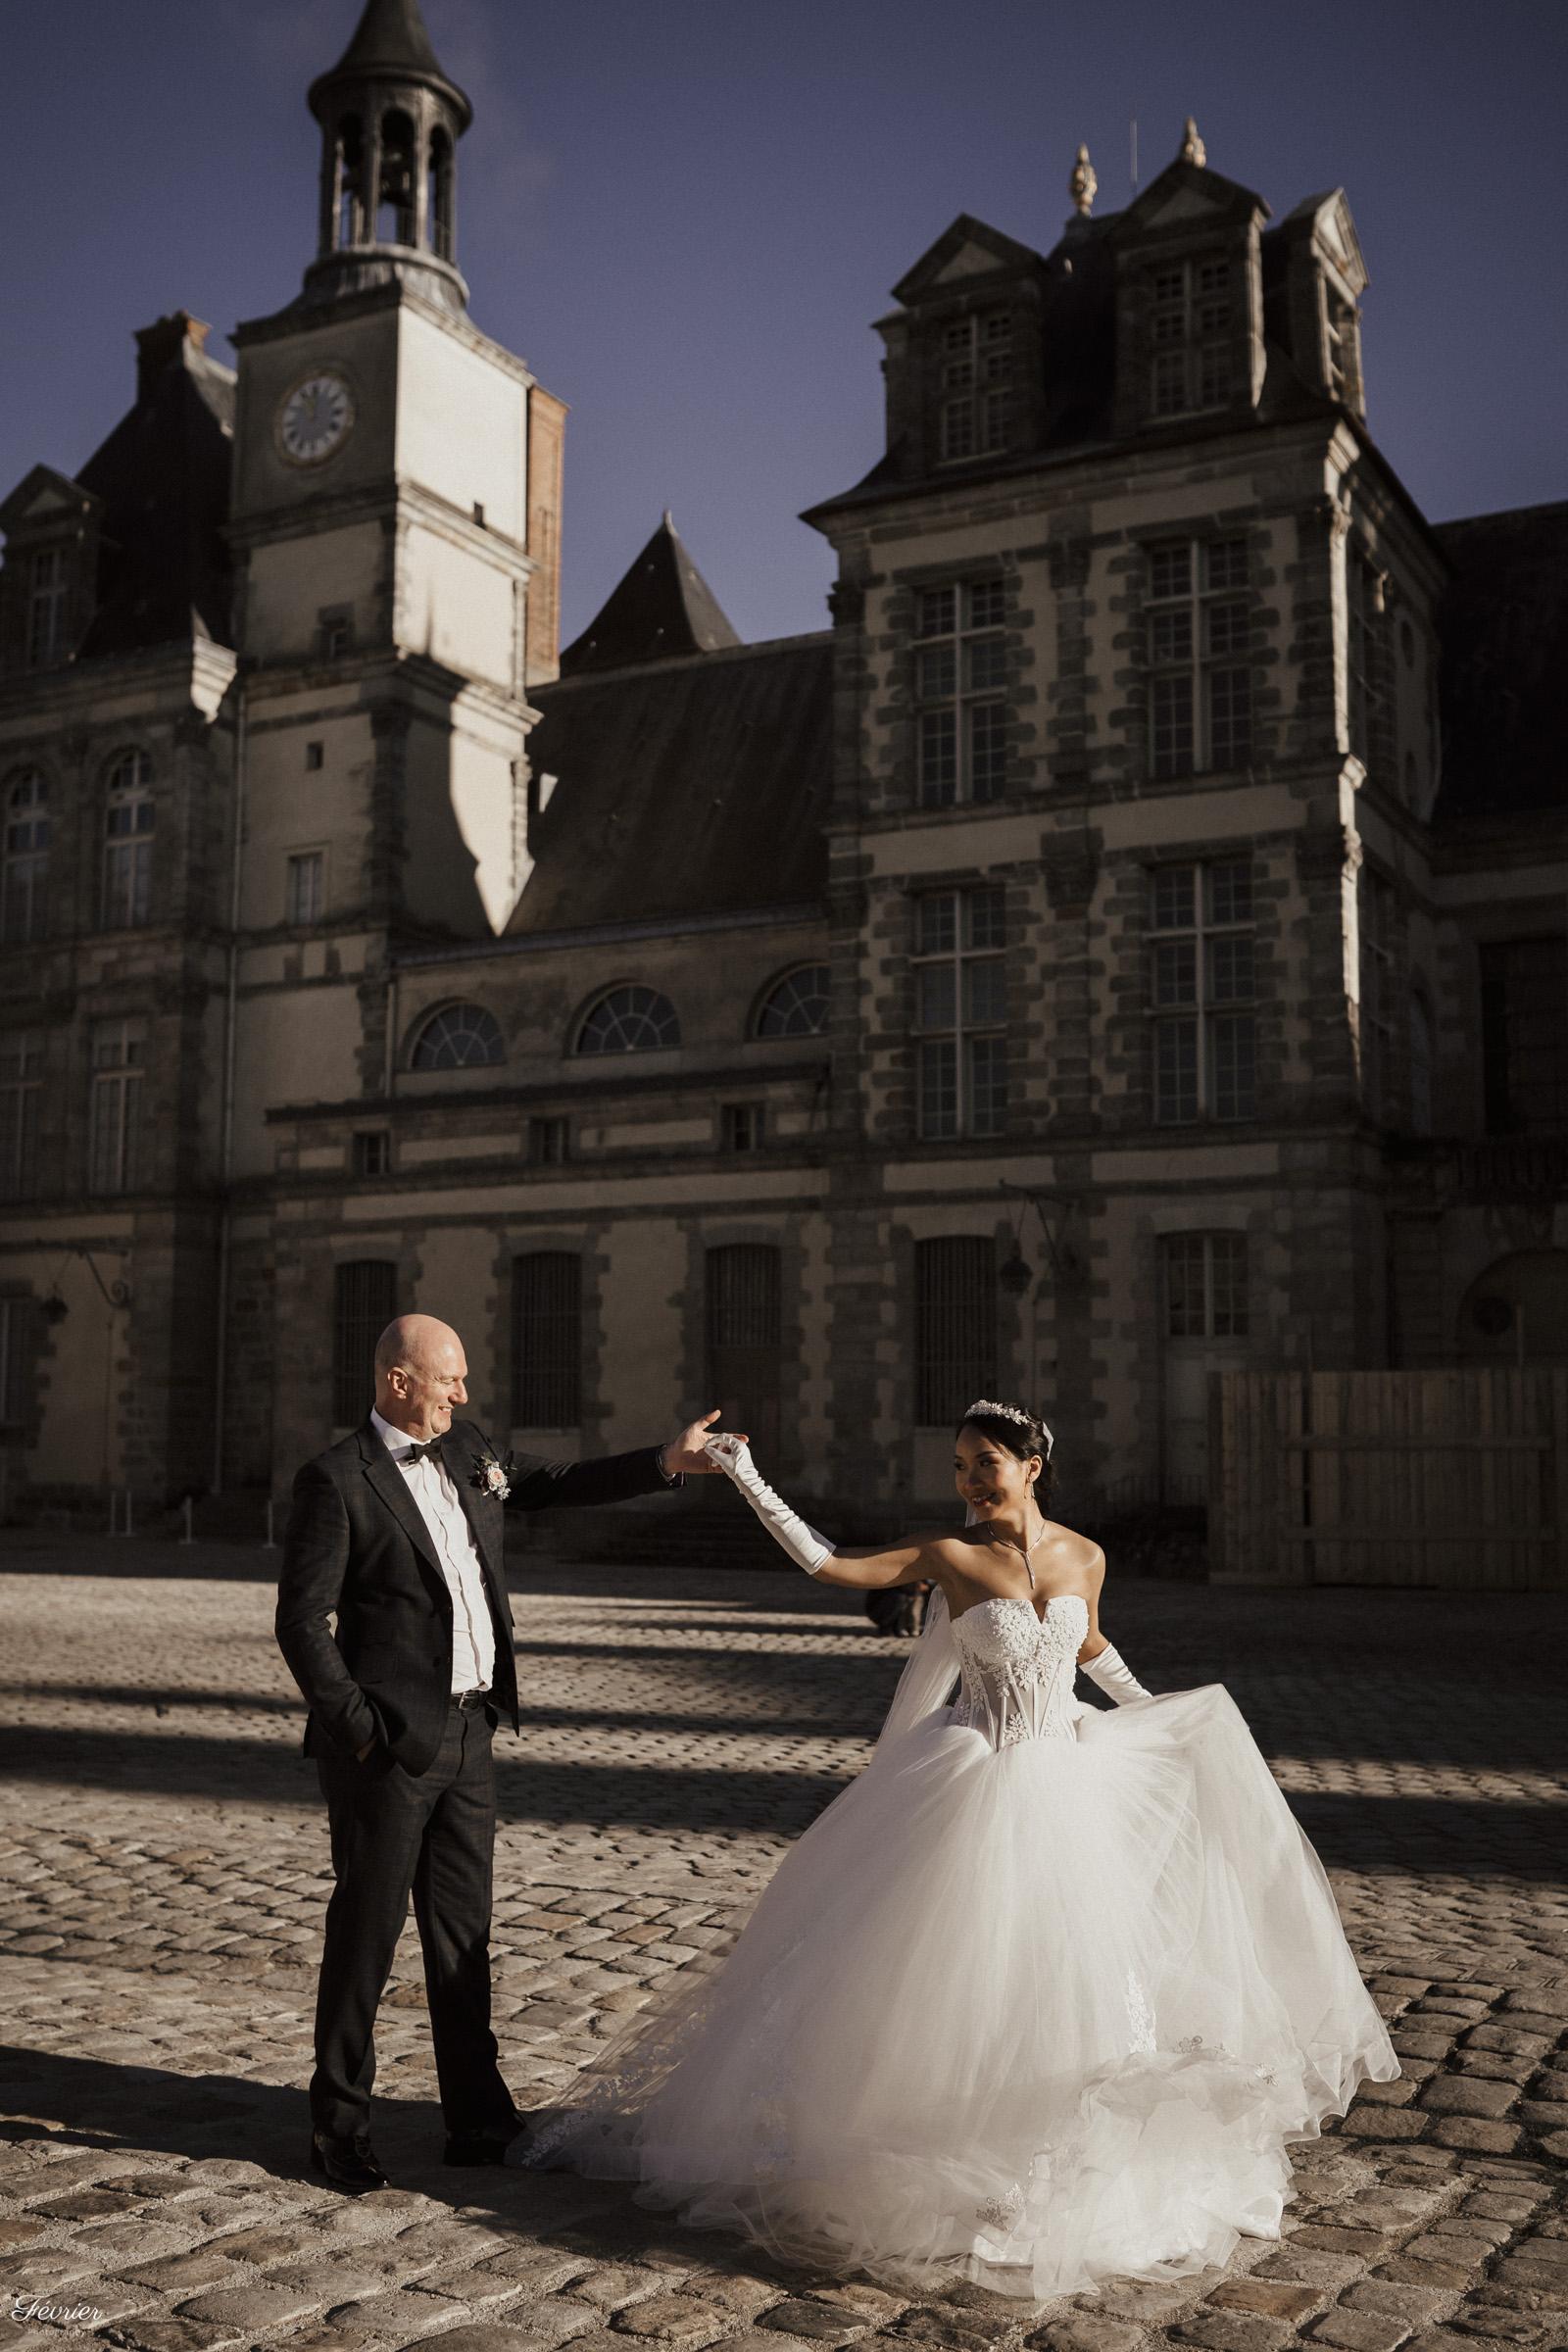 pre-wedding-hk-couple-dancing-outside-the-chateau